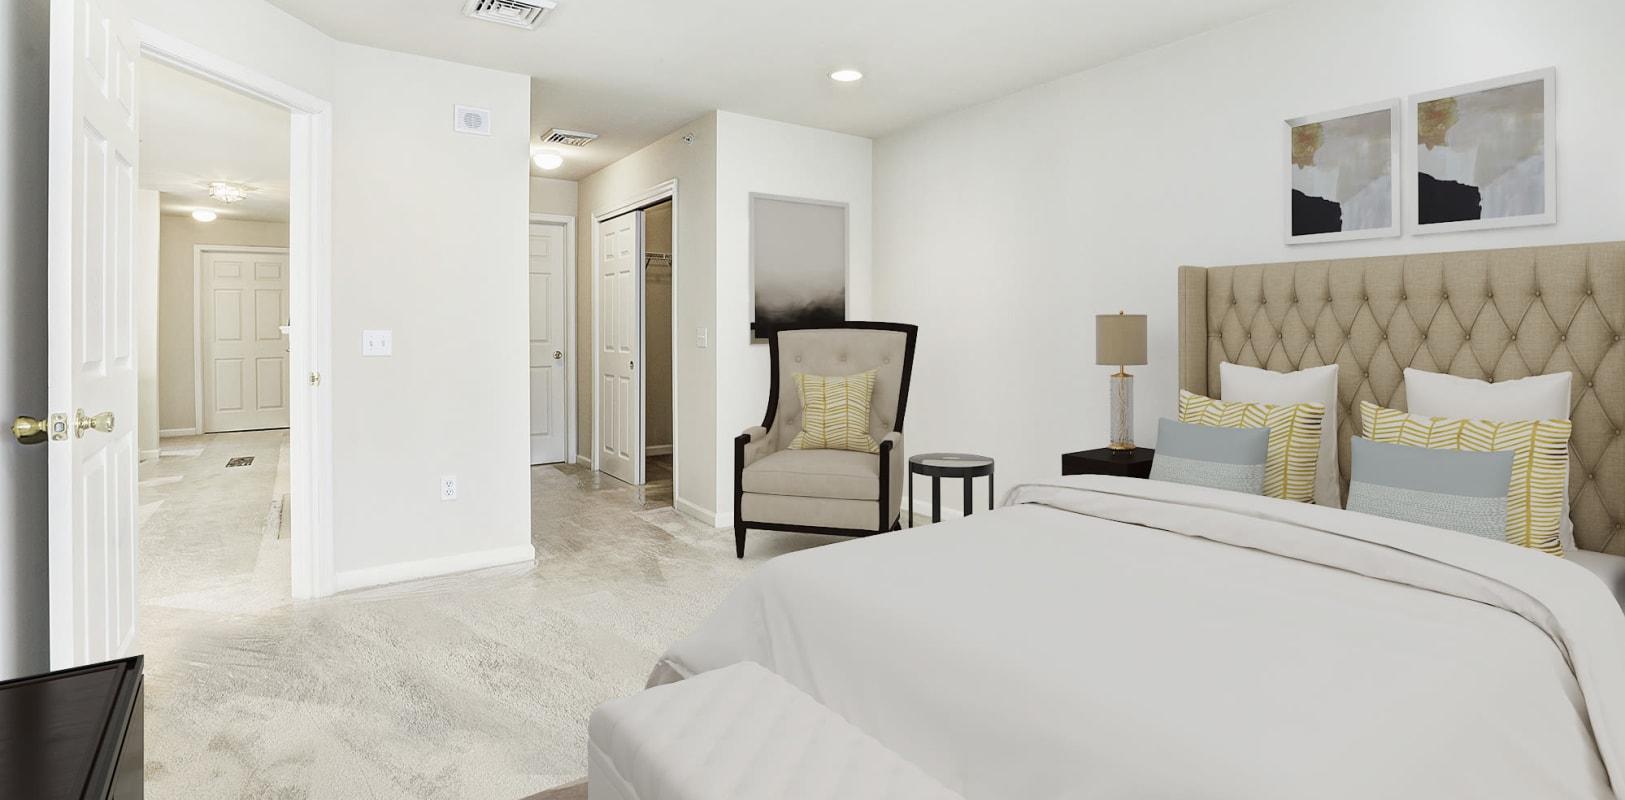 Large master bedroom with woo-style flooring at Hanover Glen in Bethlehem, Pennsylvania